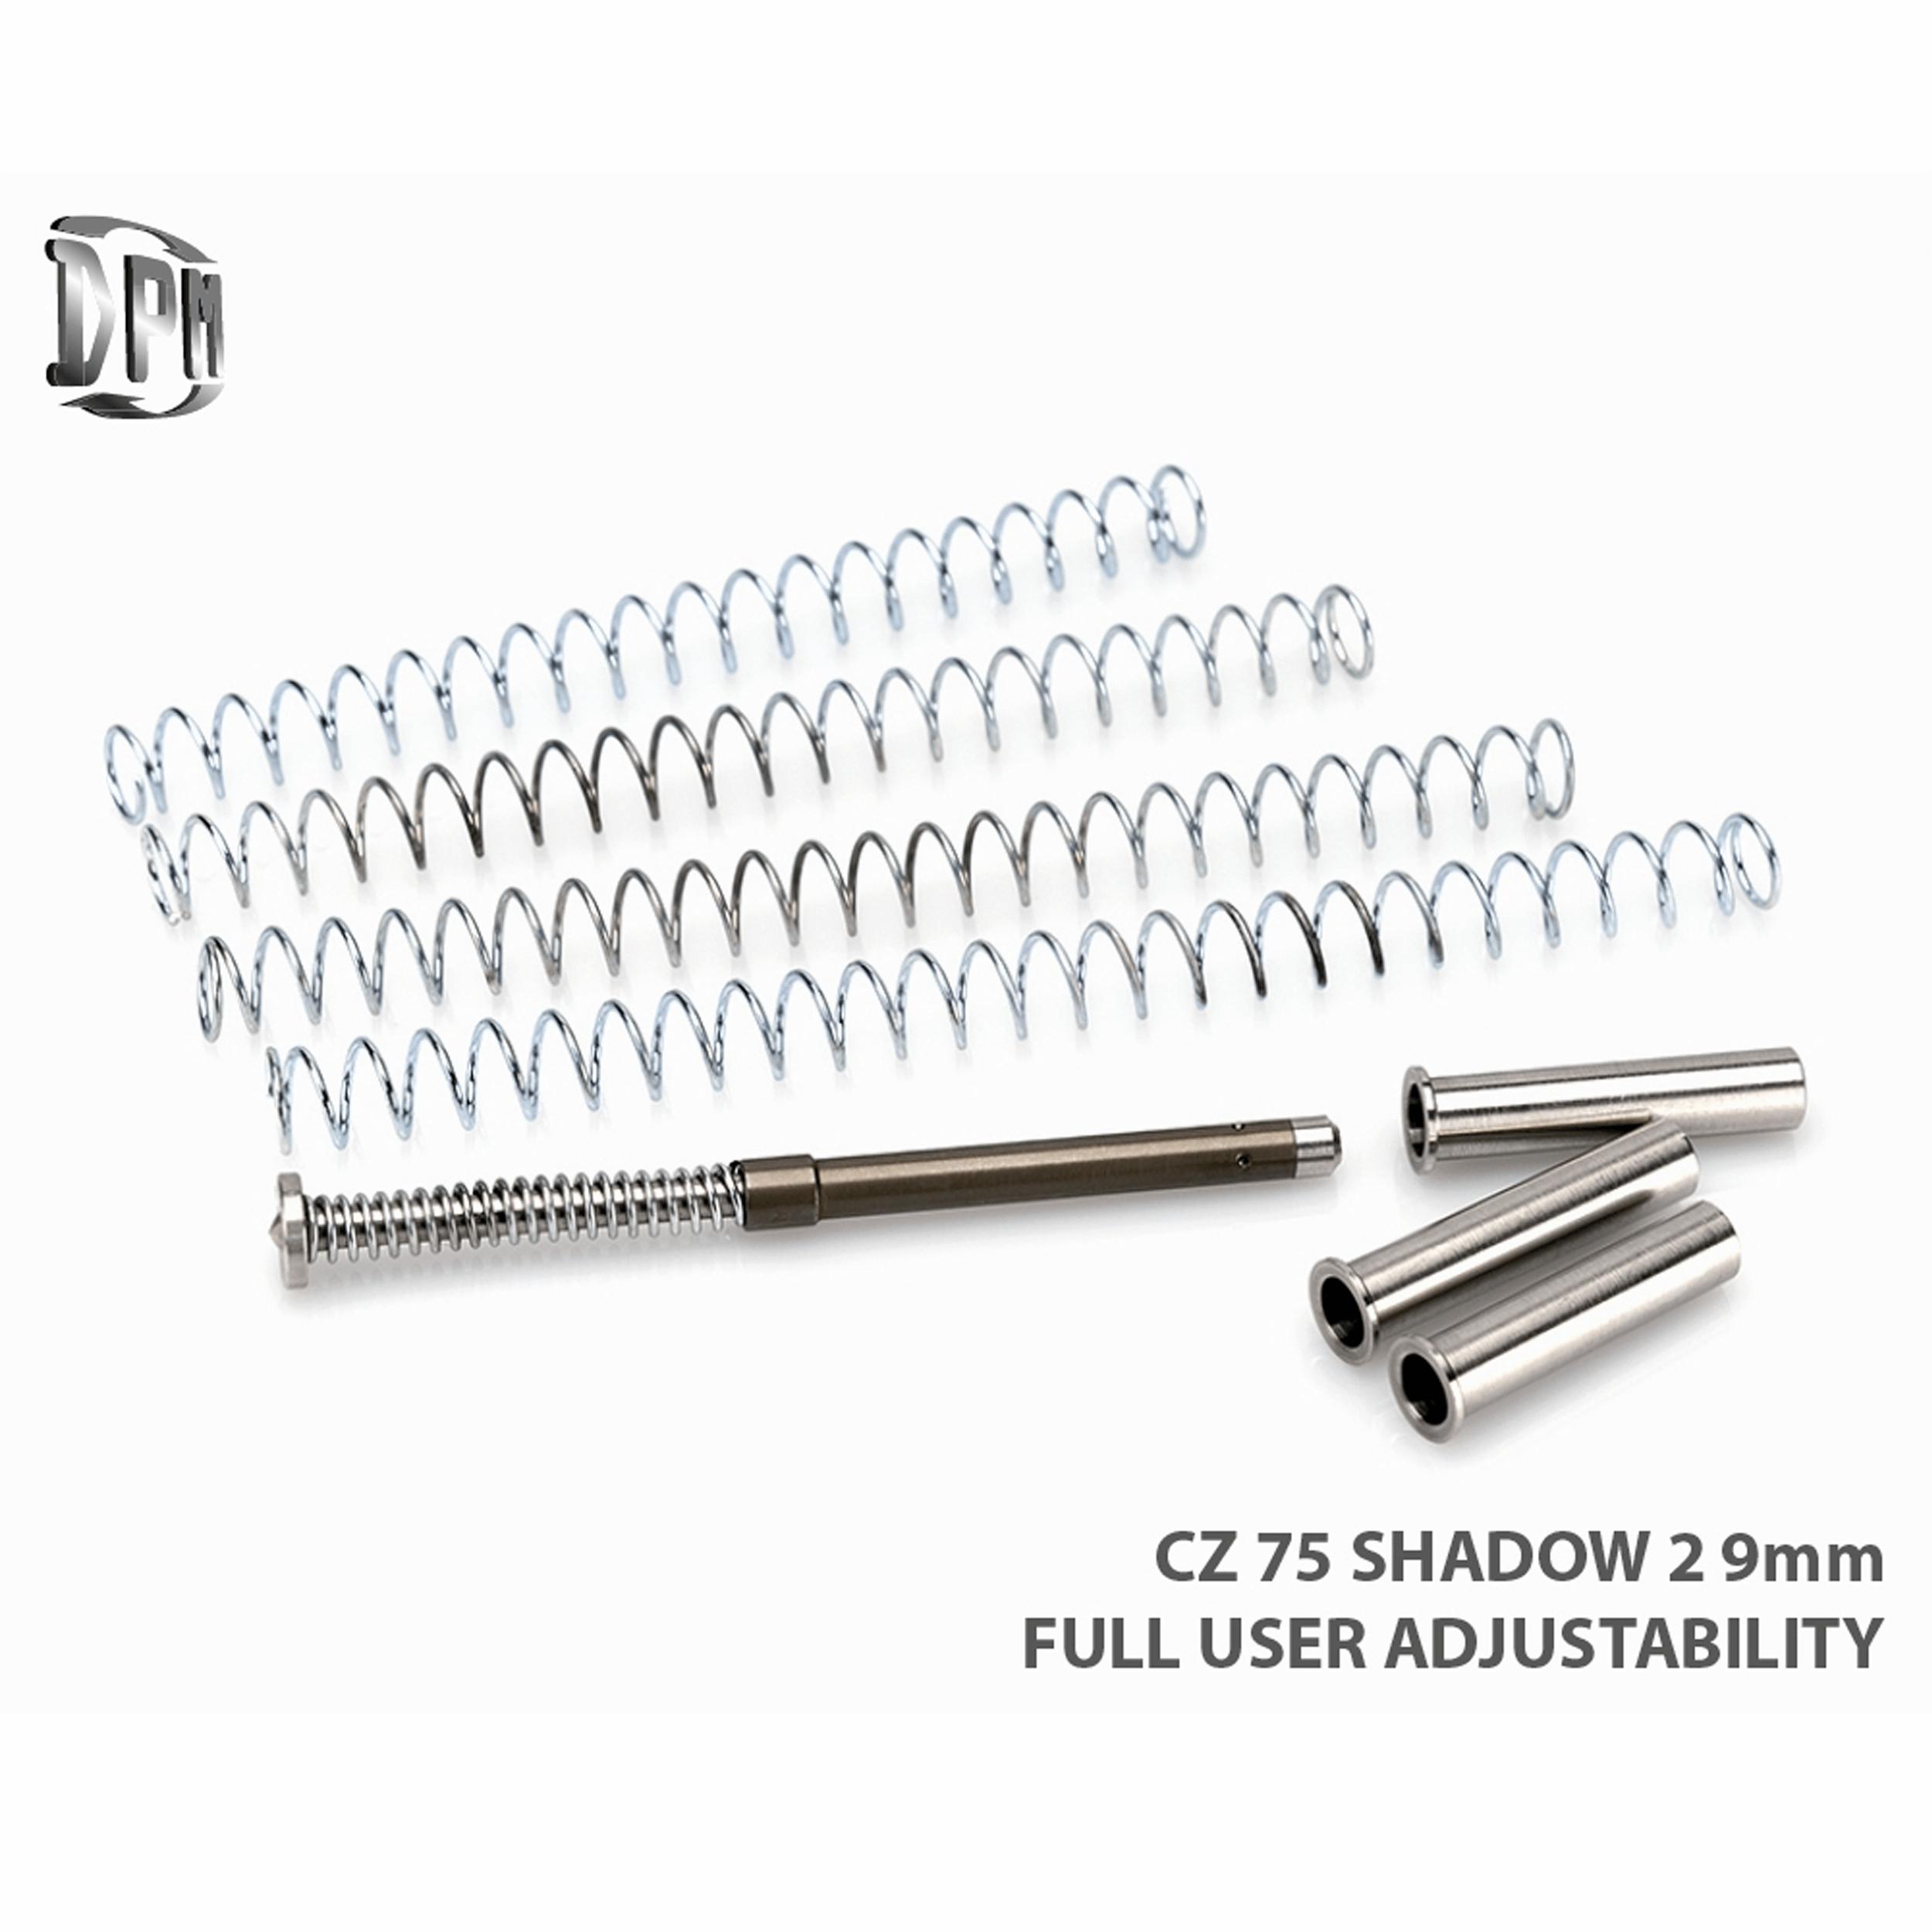 CZ Shadow 2 - 9mm - with 12 user adjustabilities